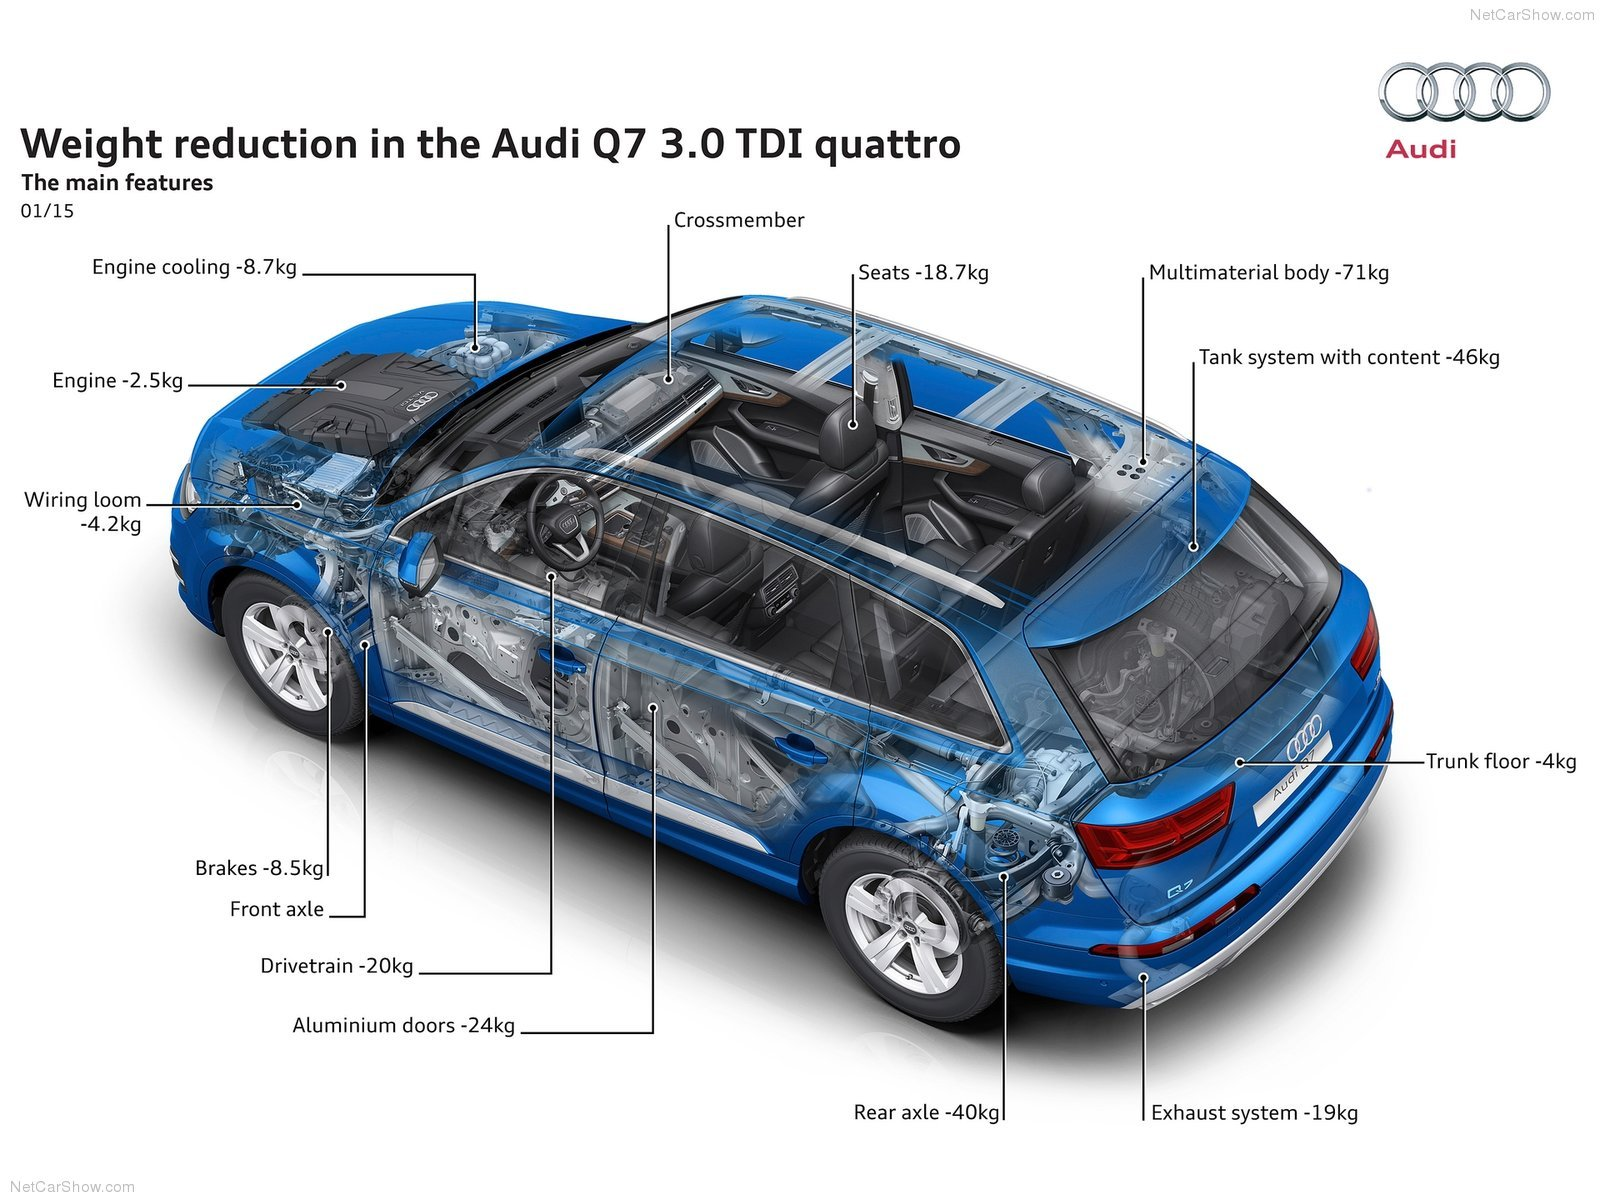 Audi Q7 Car Wallpaper Audi Q7 Cars Suv 2016 Cutaway Wallpaper 1600x1200